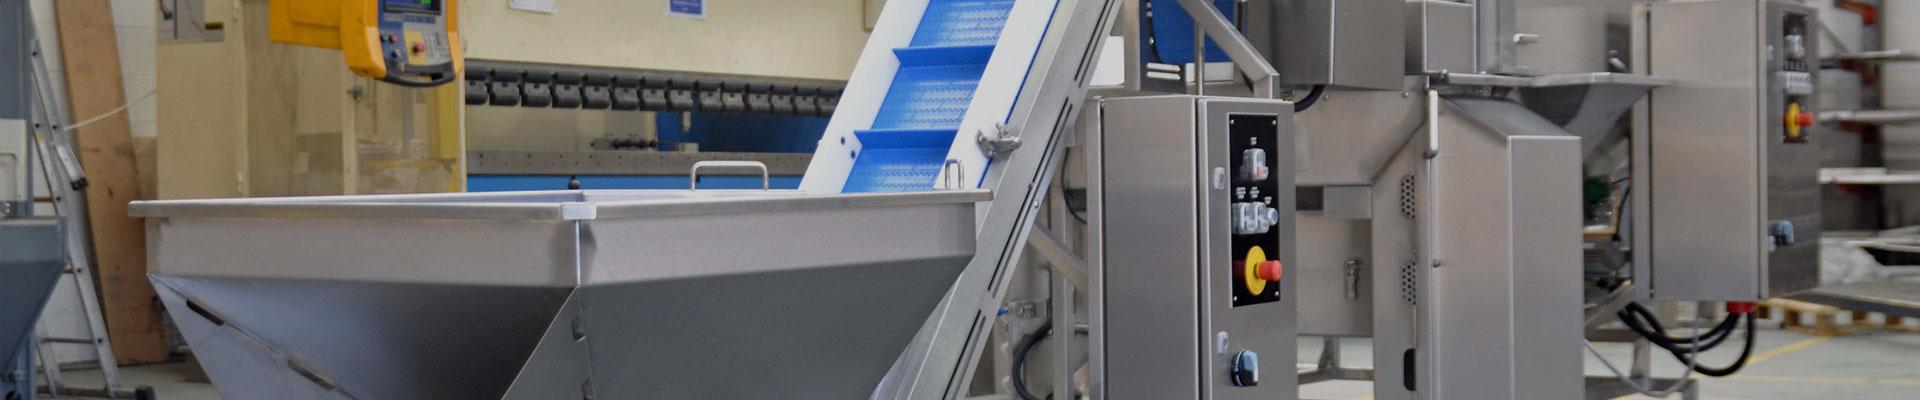 food processing machine manufacturers